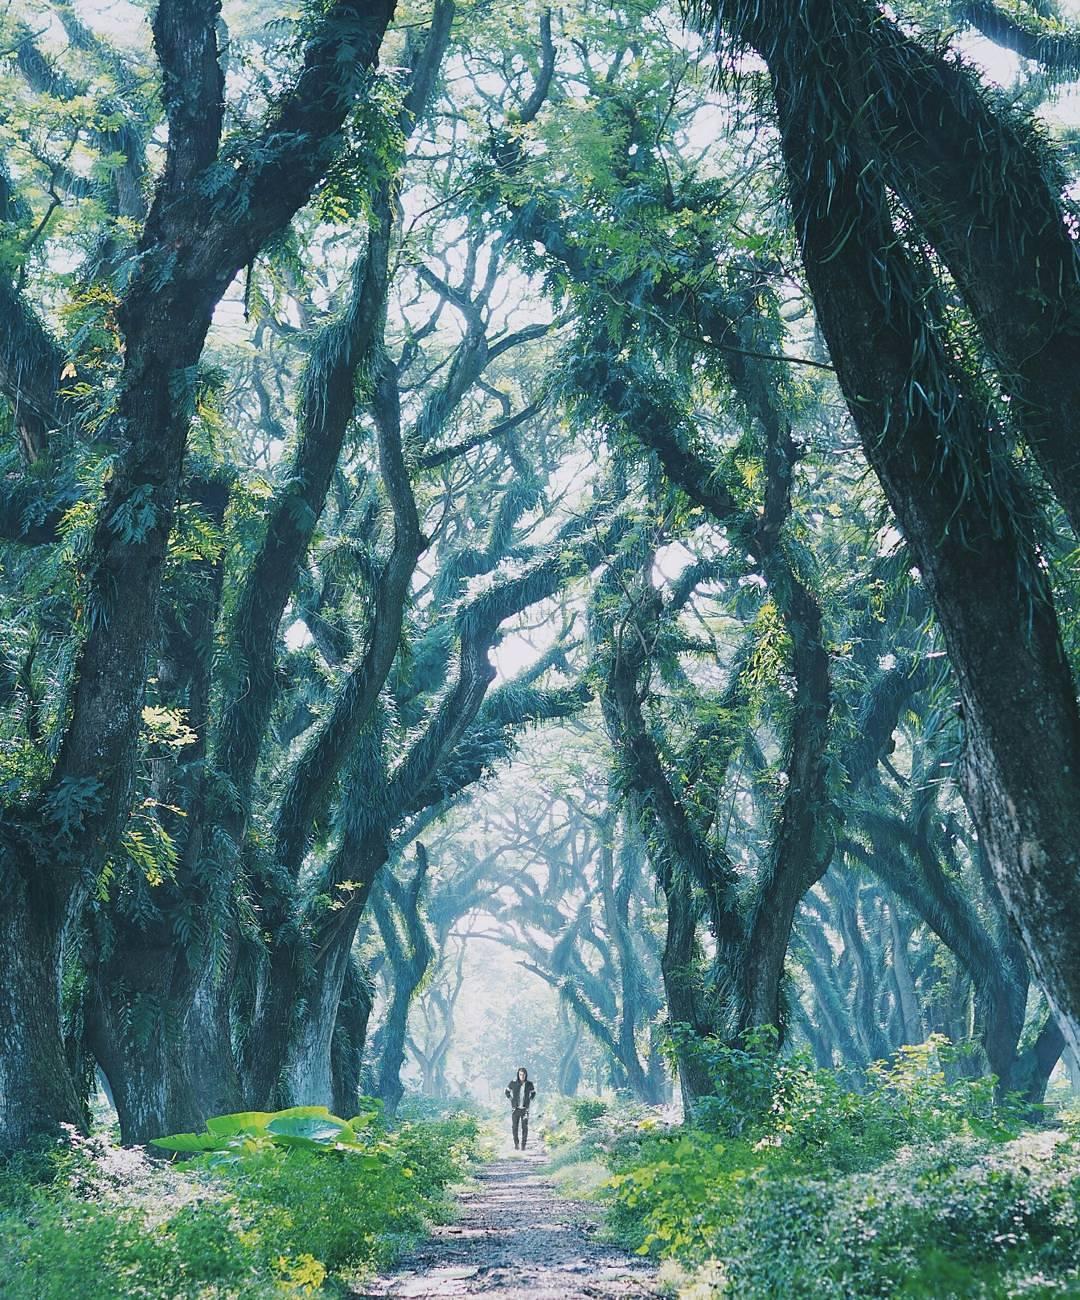 Ada Hutan ala Film Lord of the Rings di Indonesia, ke Sini Yuk!